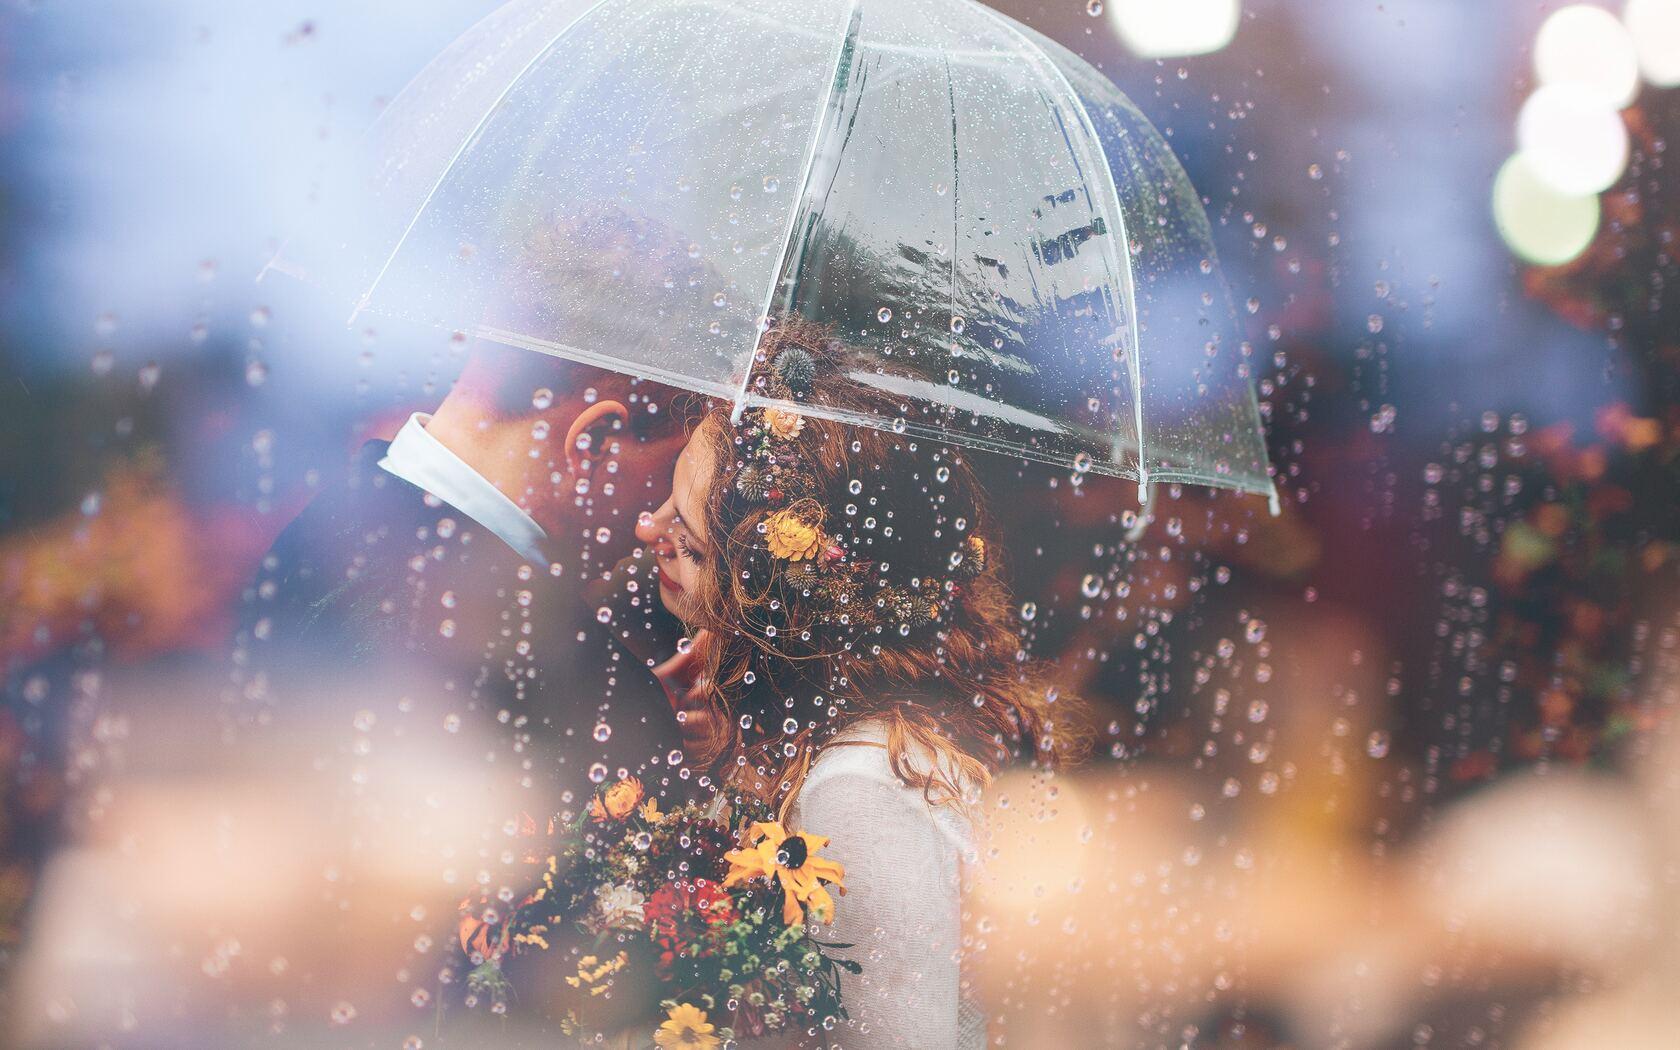 married-couple-romantic-umbrella-raining-weeding-57.jpg